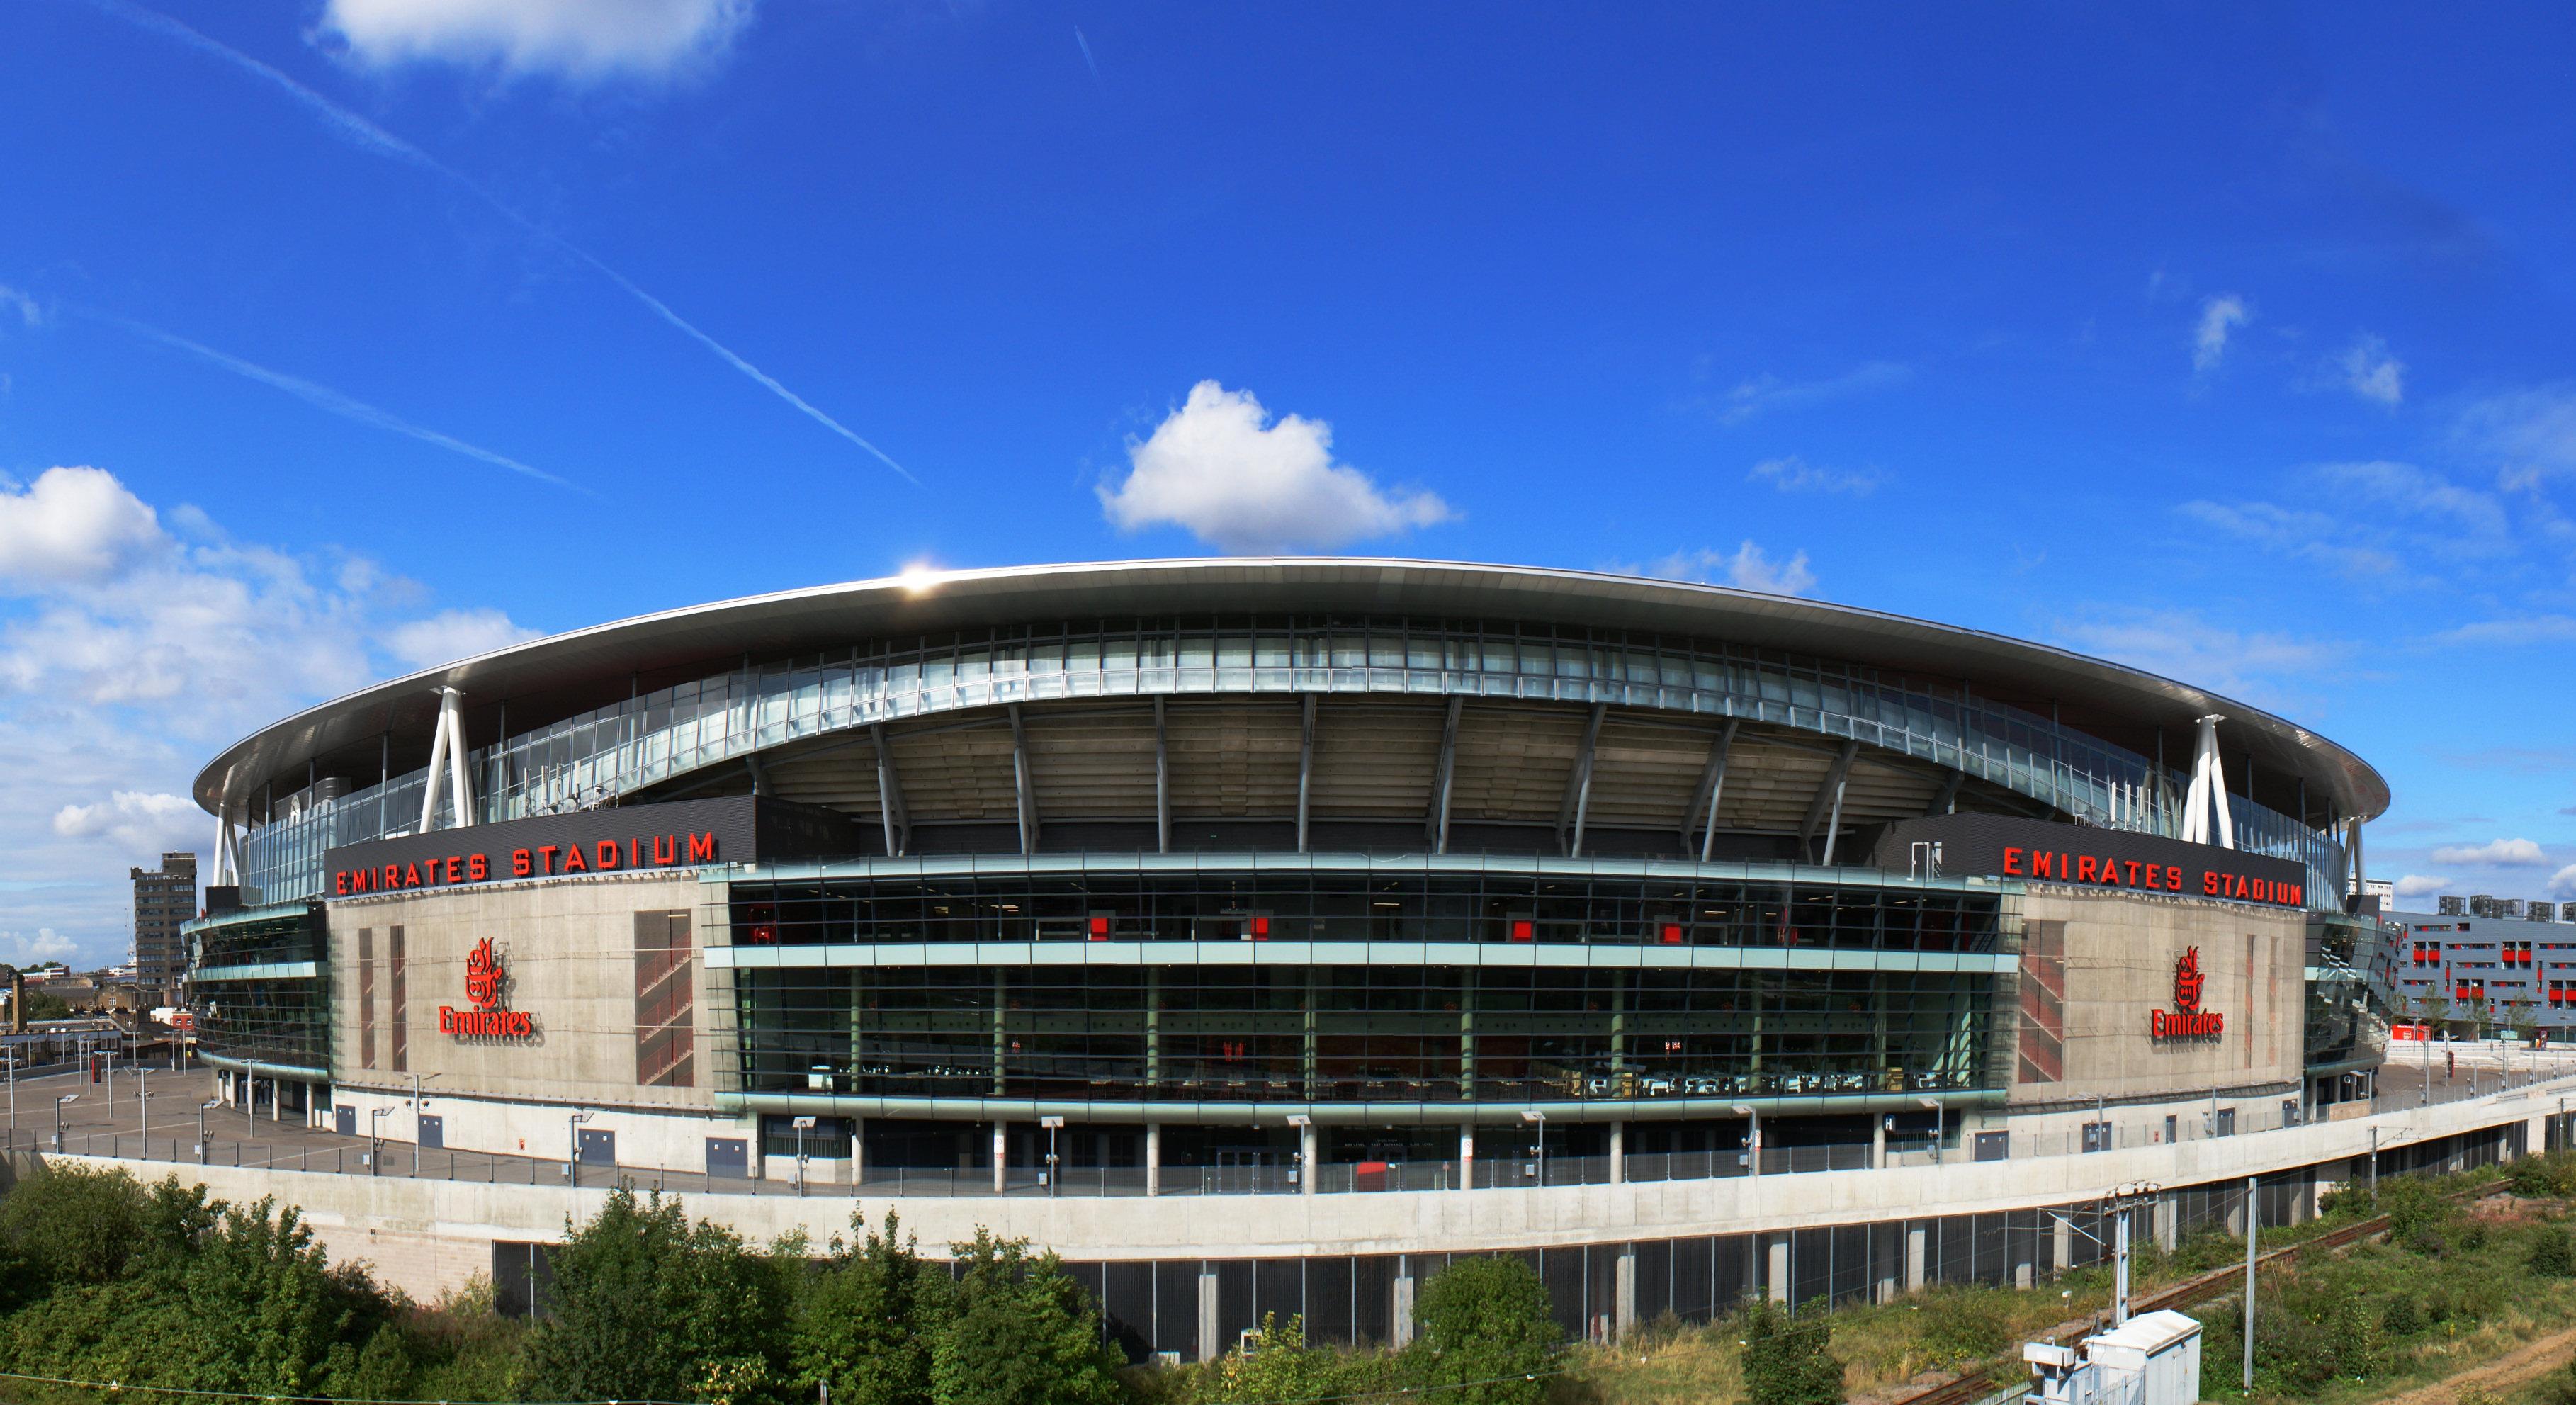 Hd wallpaper england - File Emirates Stadium East Side Composite Jpg